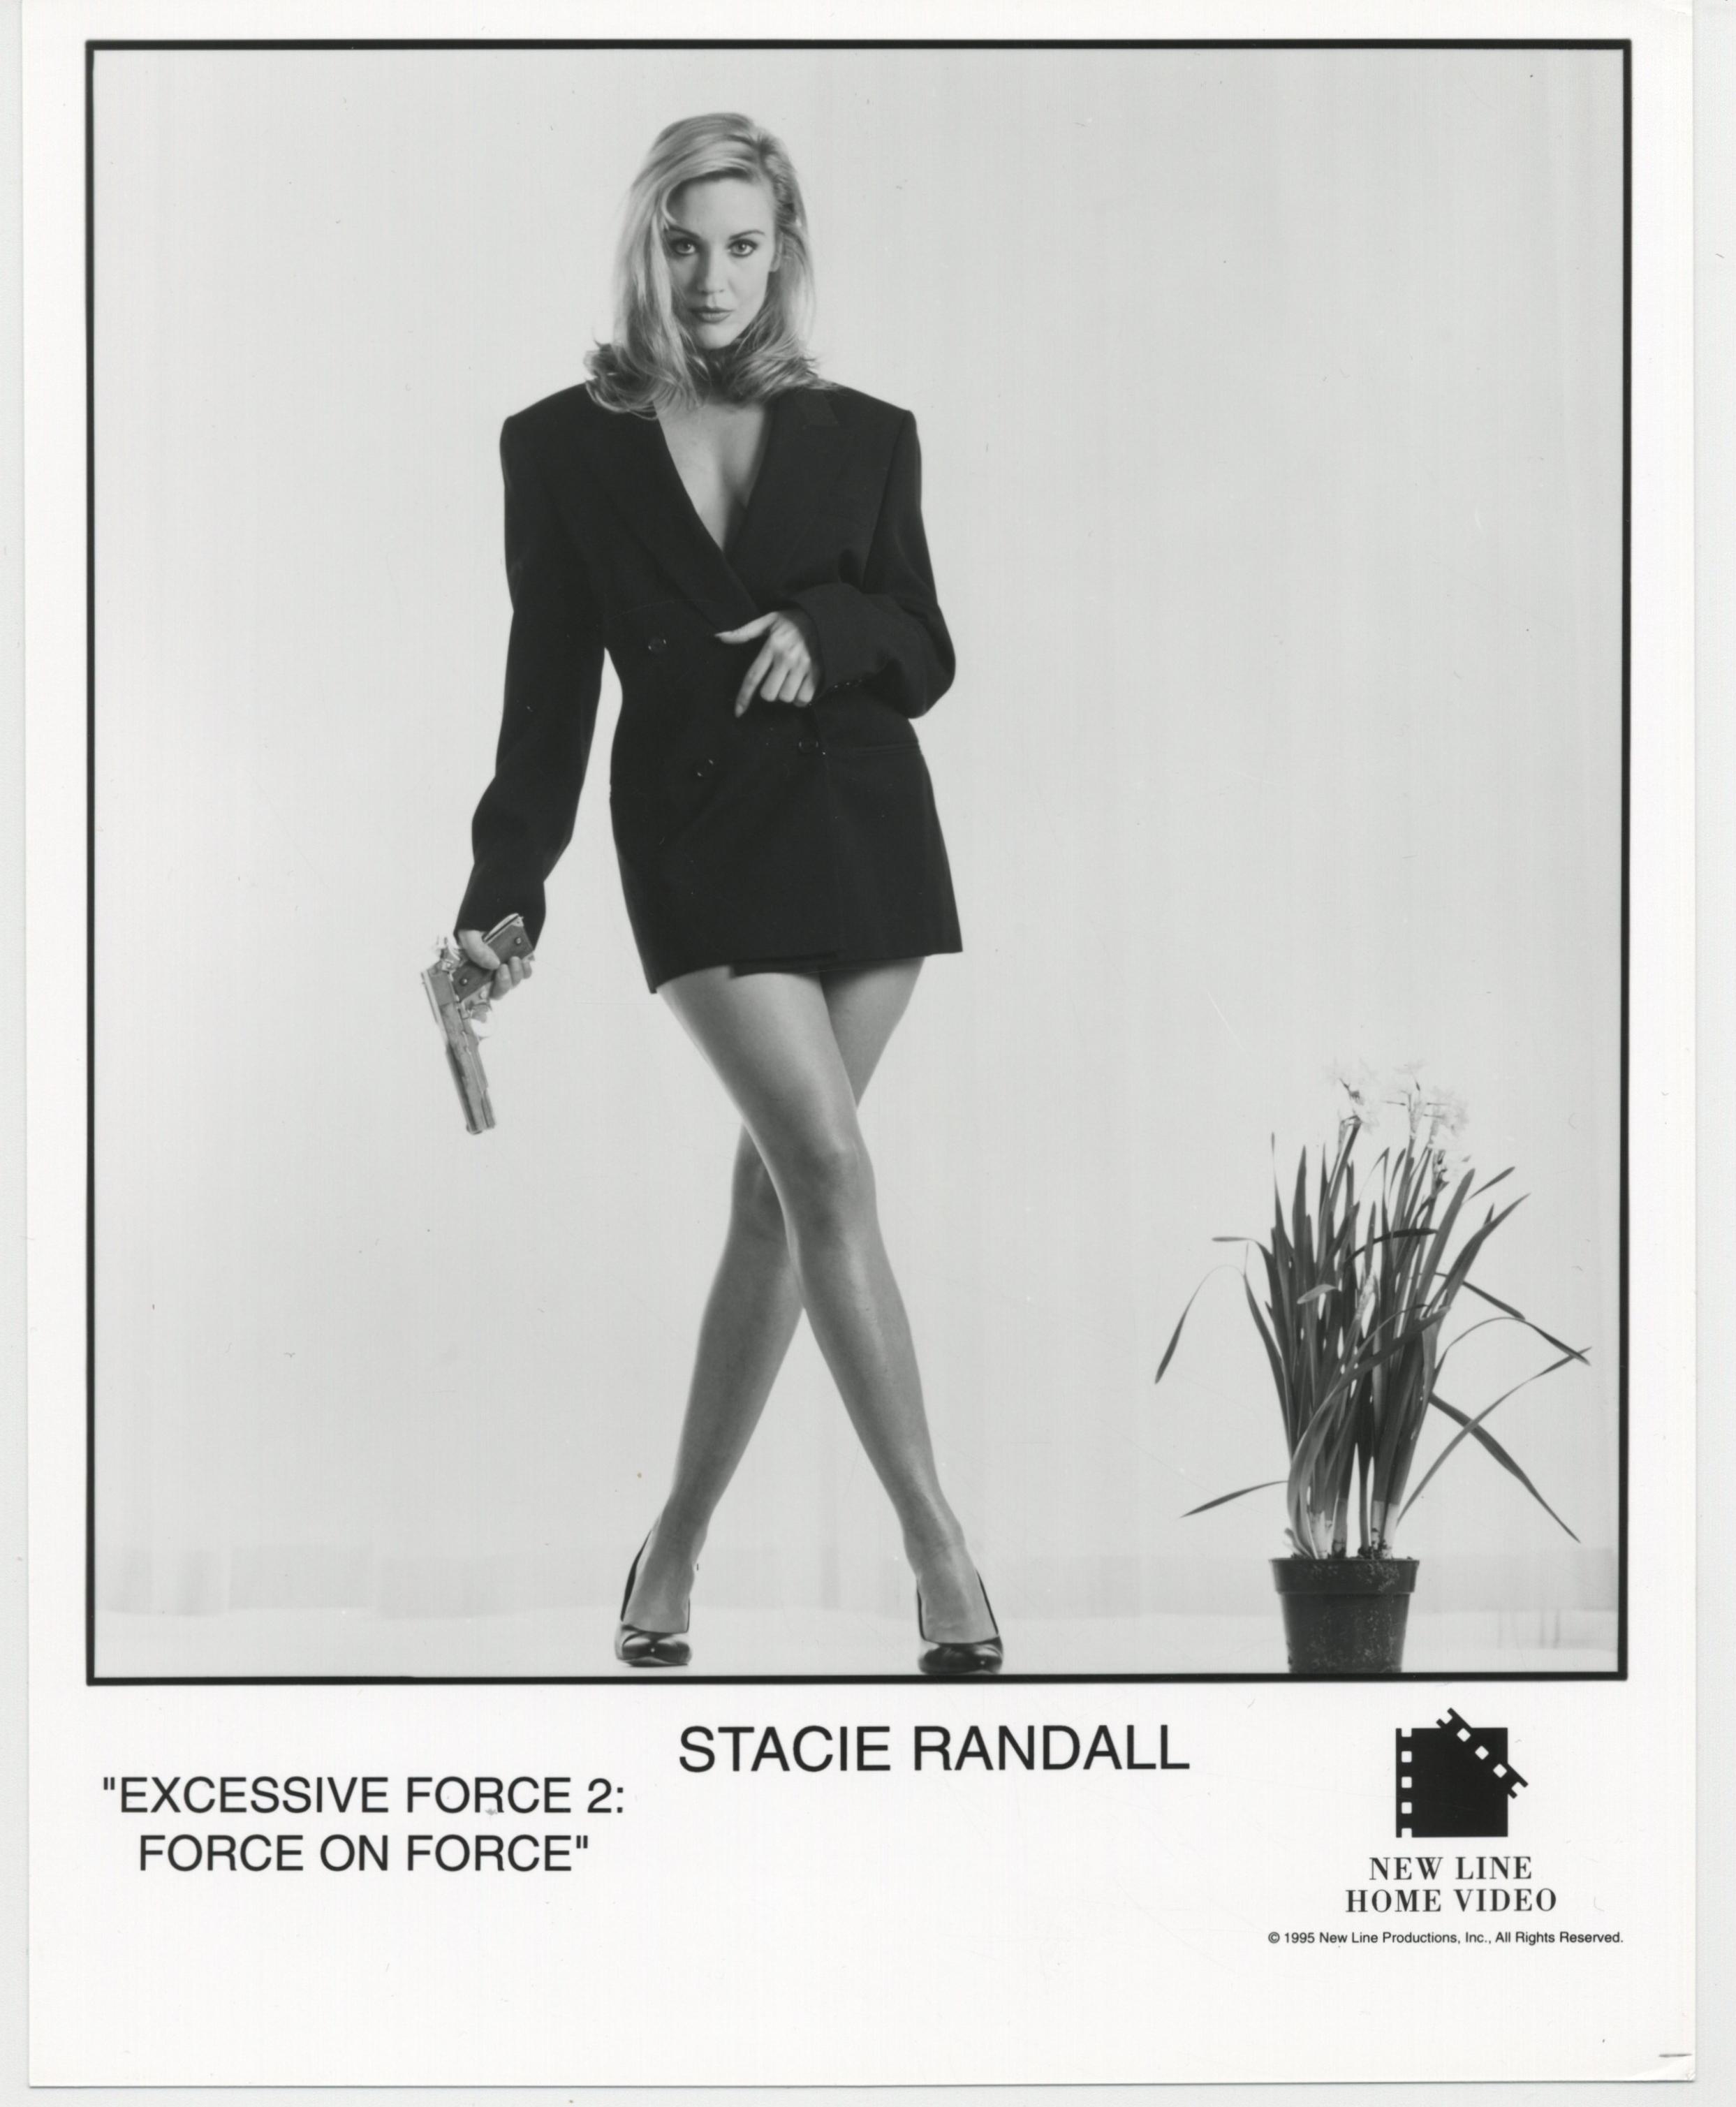 Stacie Randall